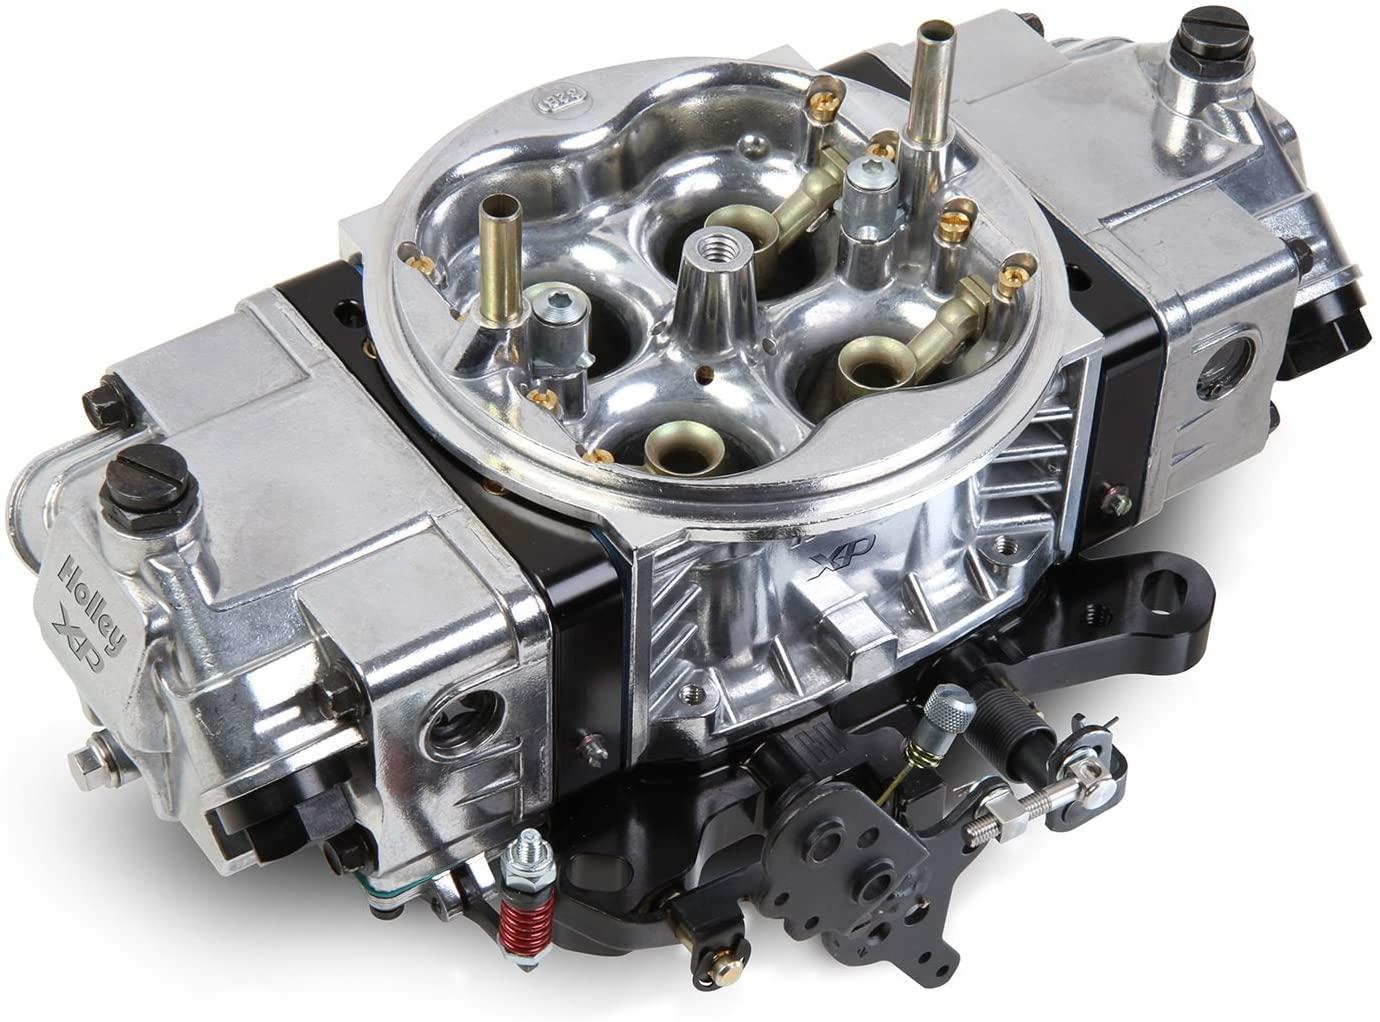 Holley 4150 Alum Ultra Xp 750 Cfm